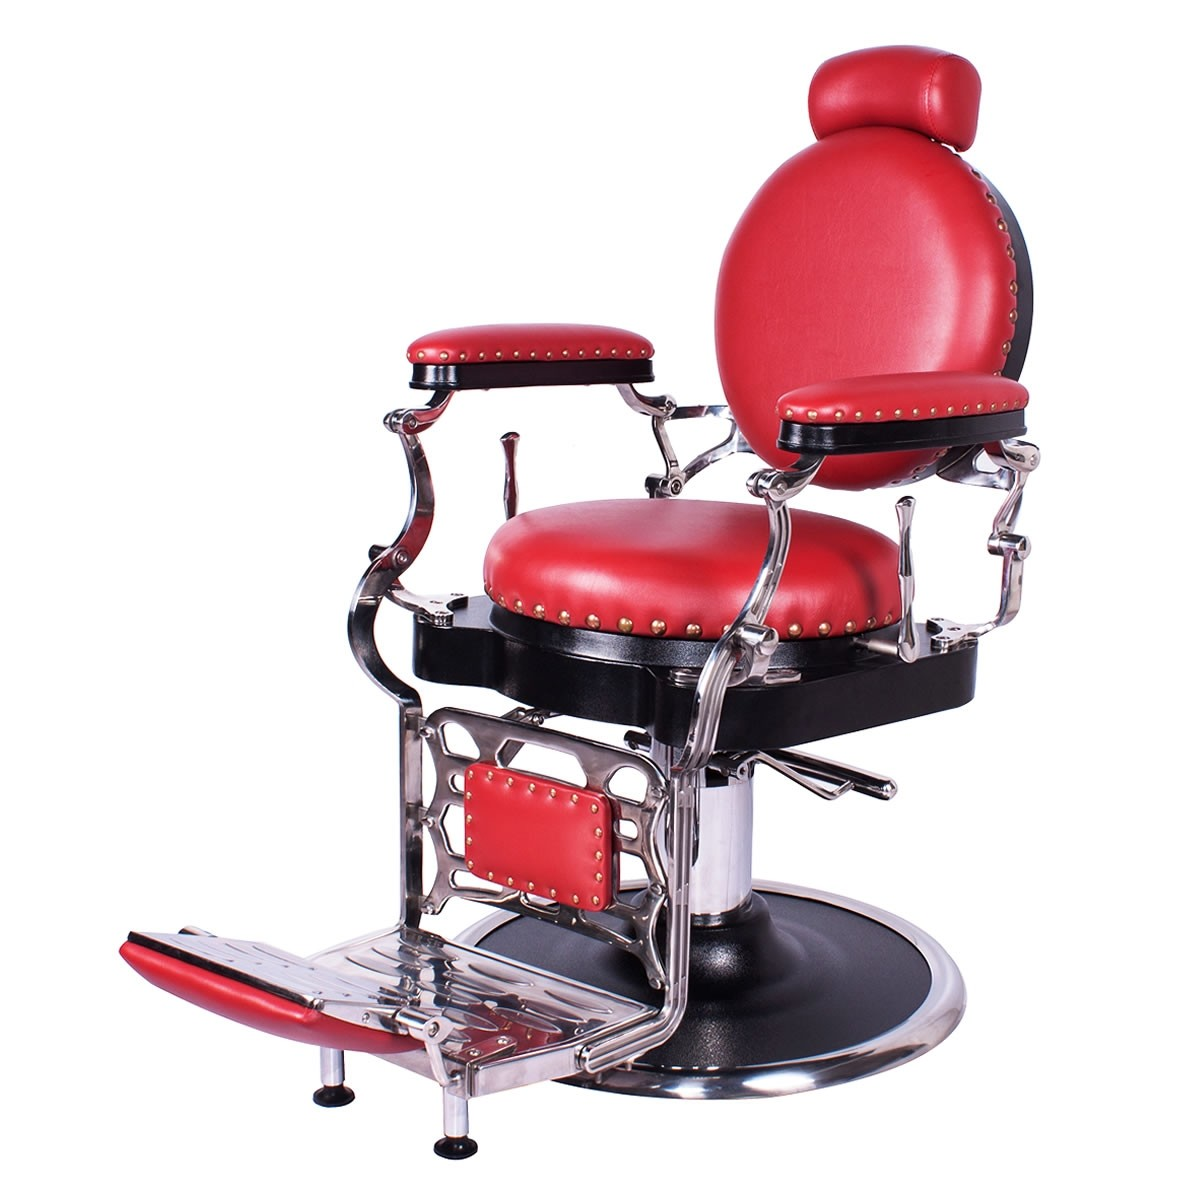 """ZENO"" Antique Barbershop Chair in Cardinal Red"